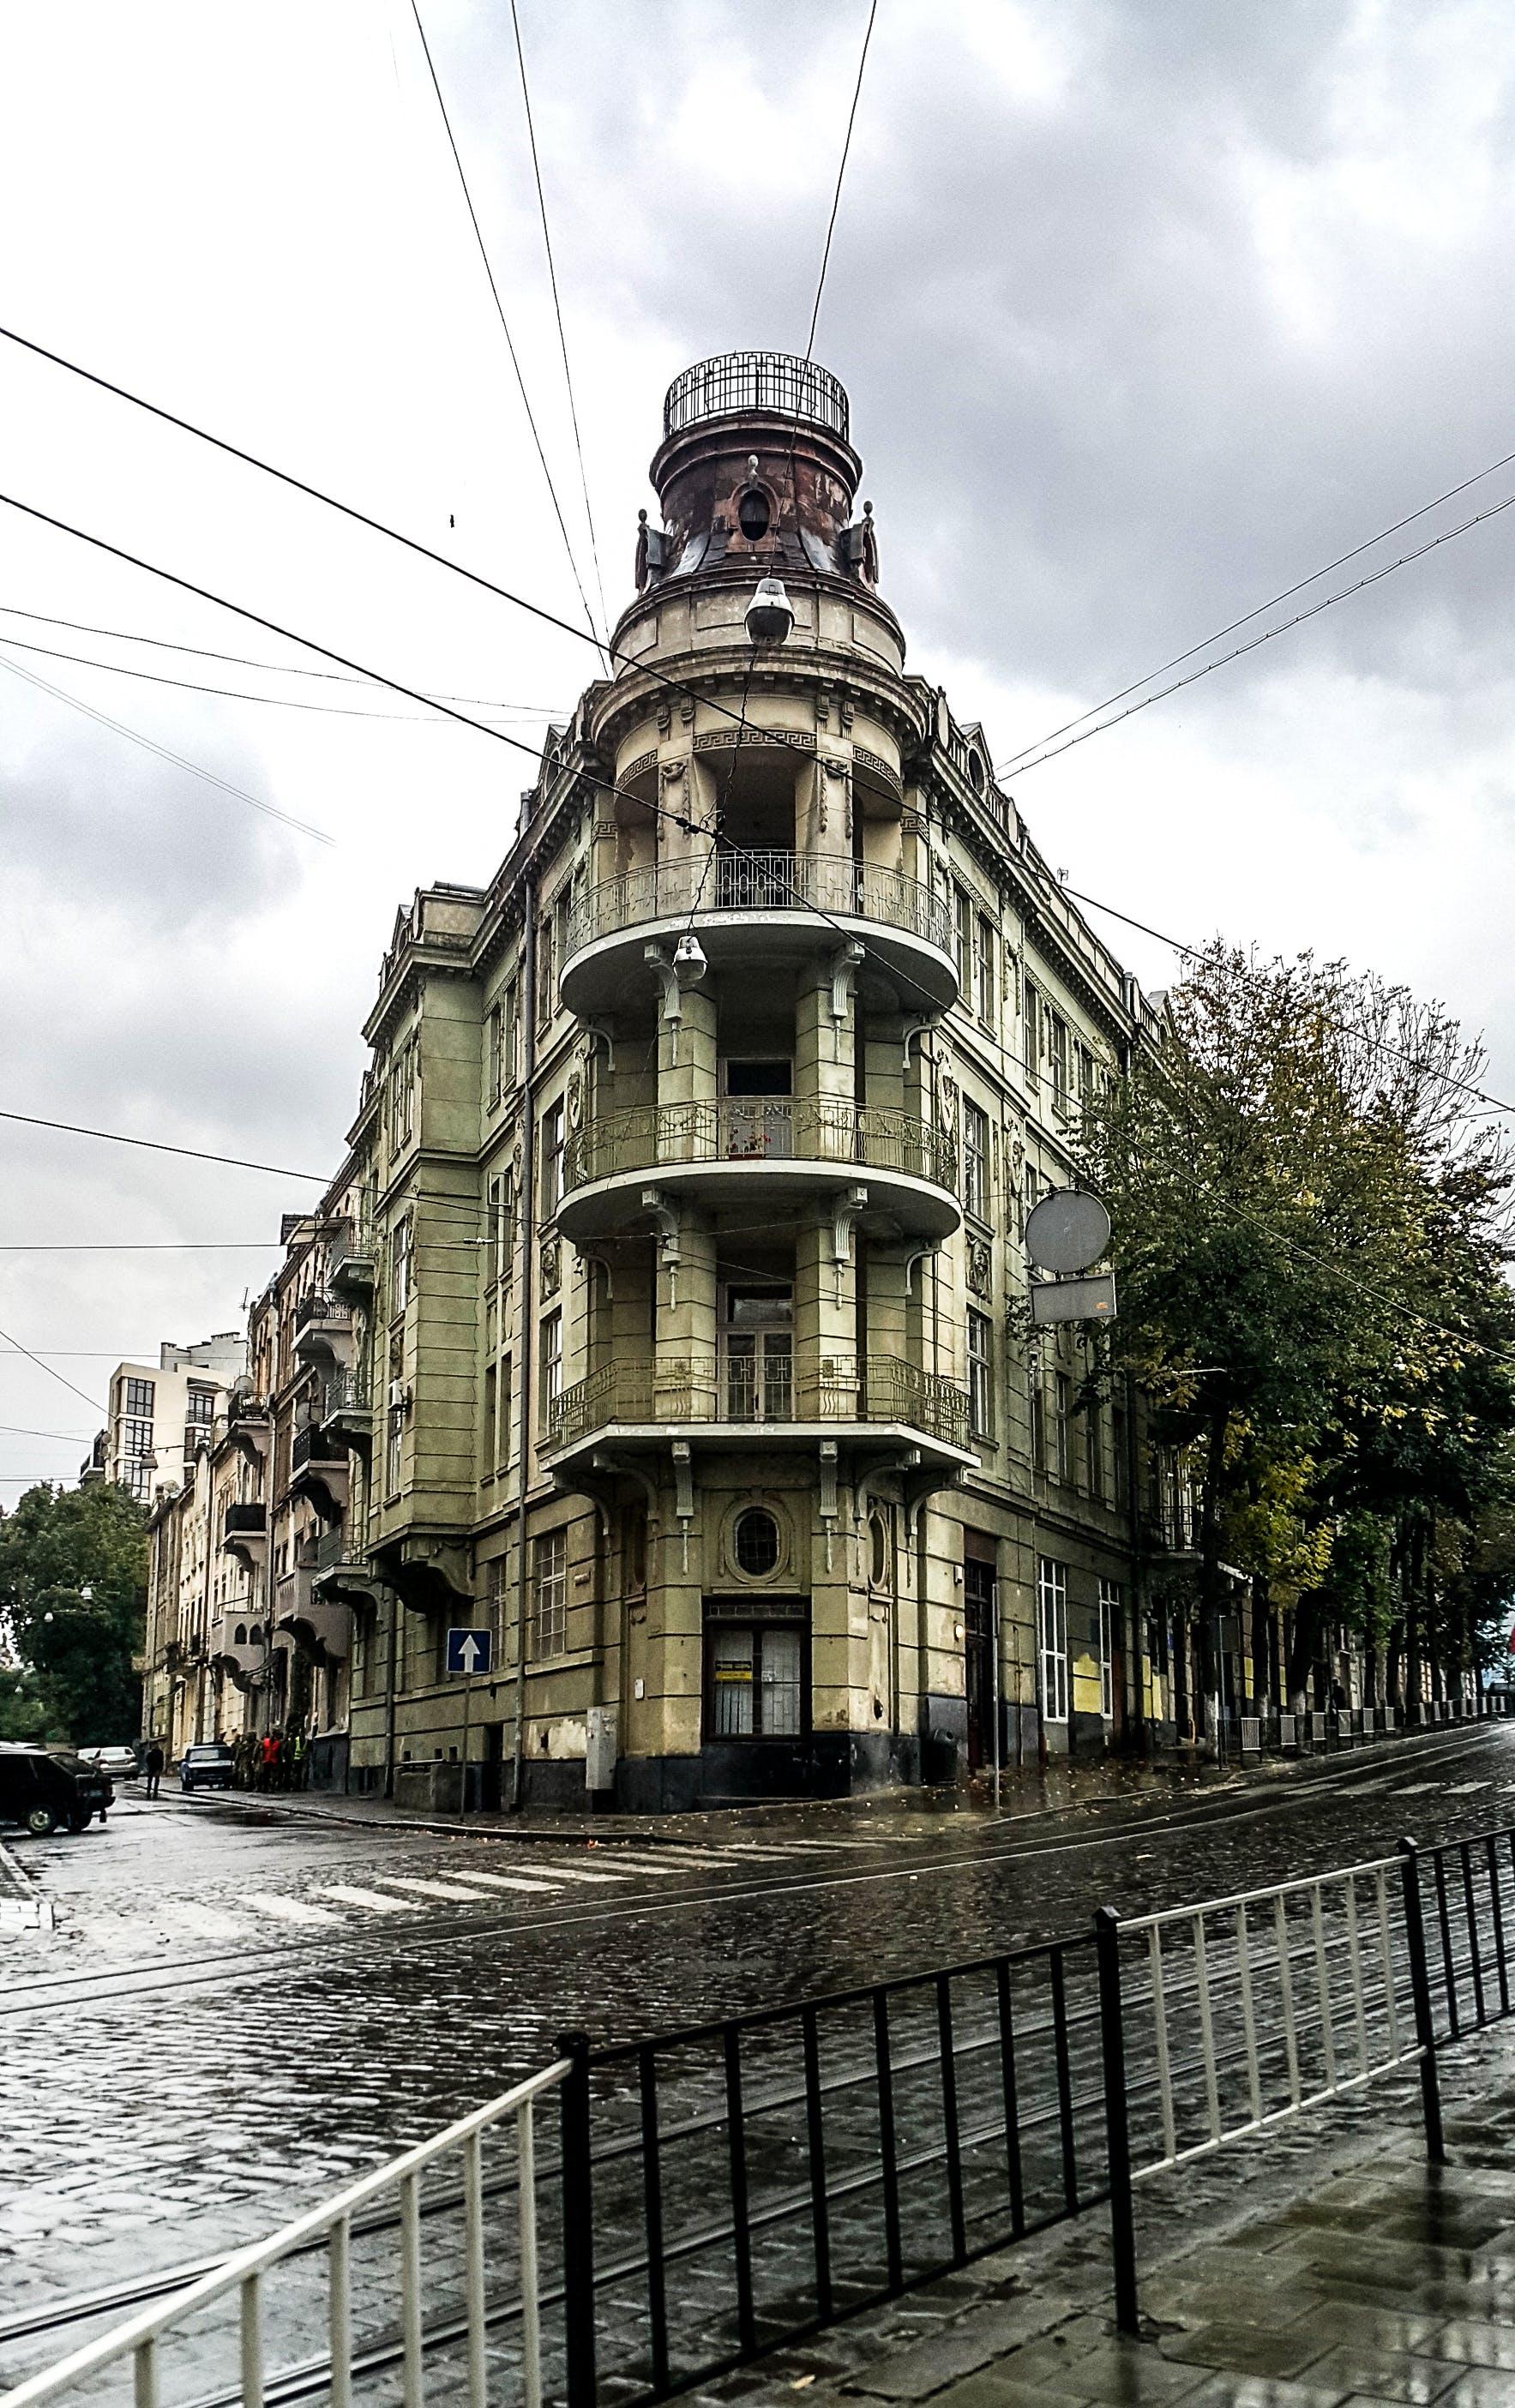 Free stock photo of architecture, city landscape, Lviv, rain